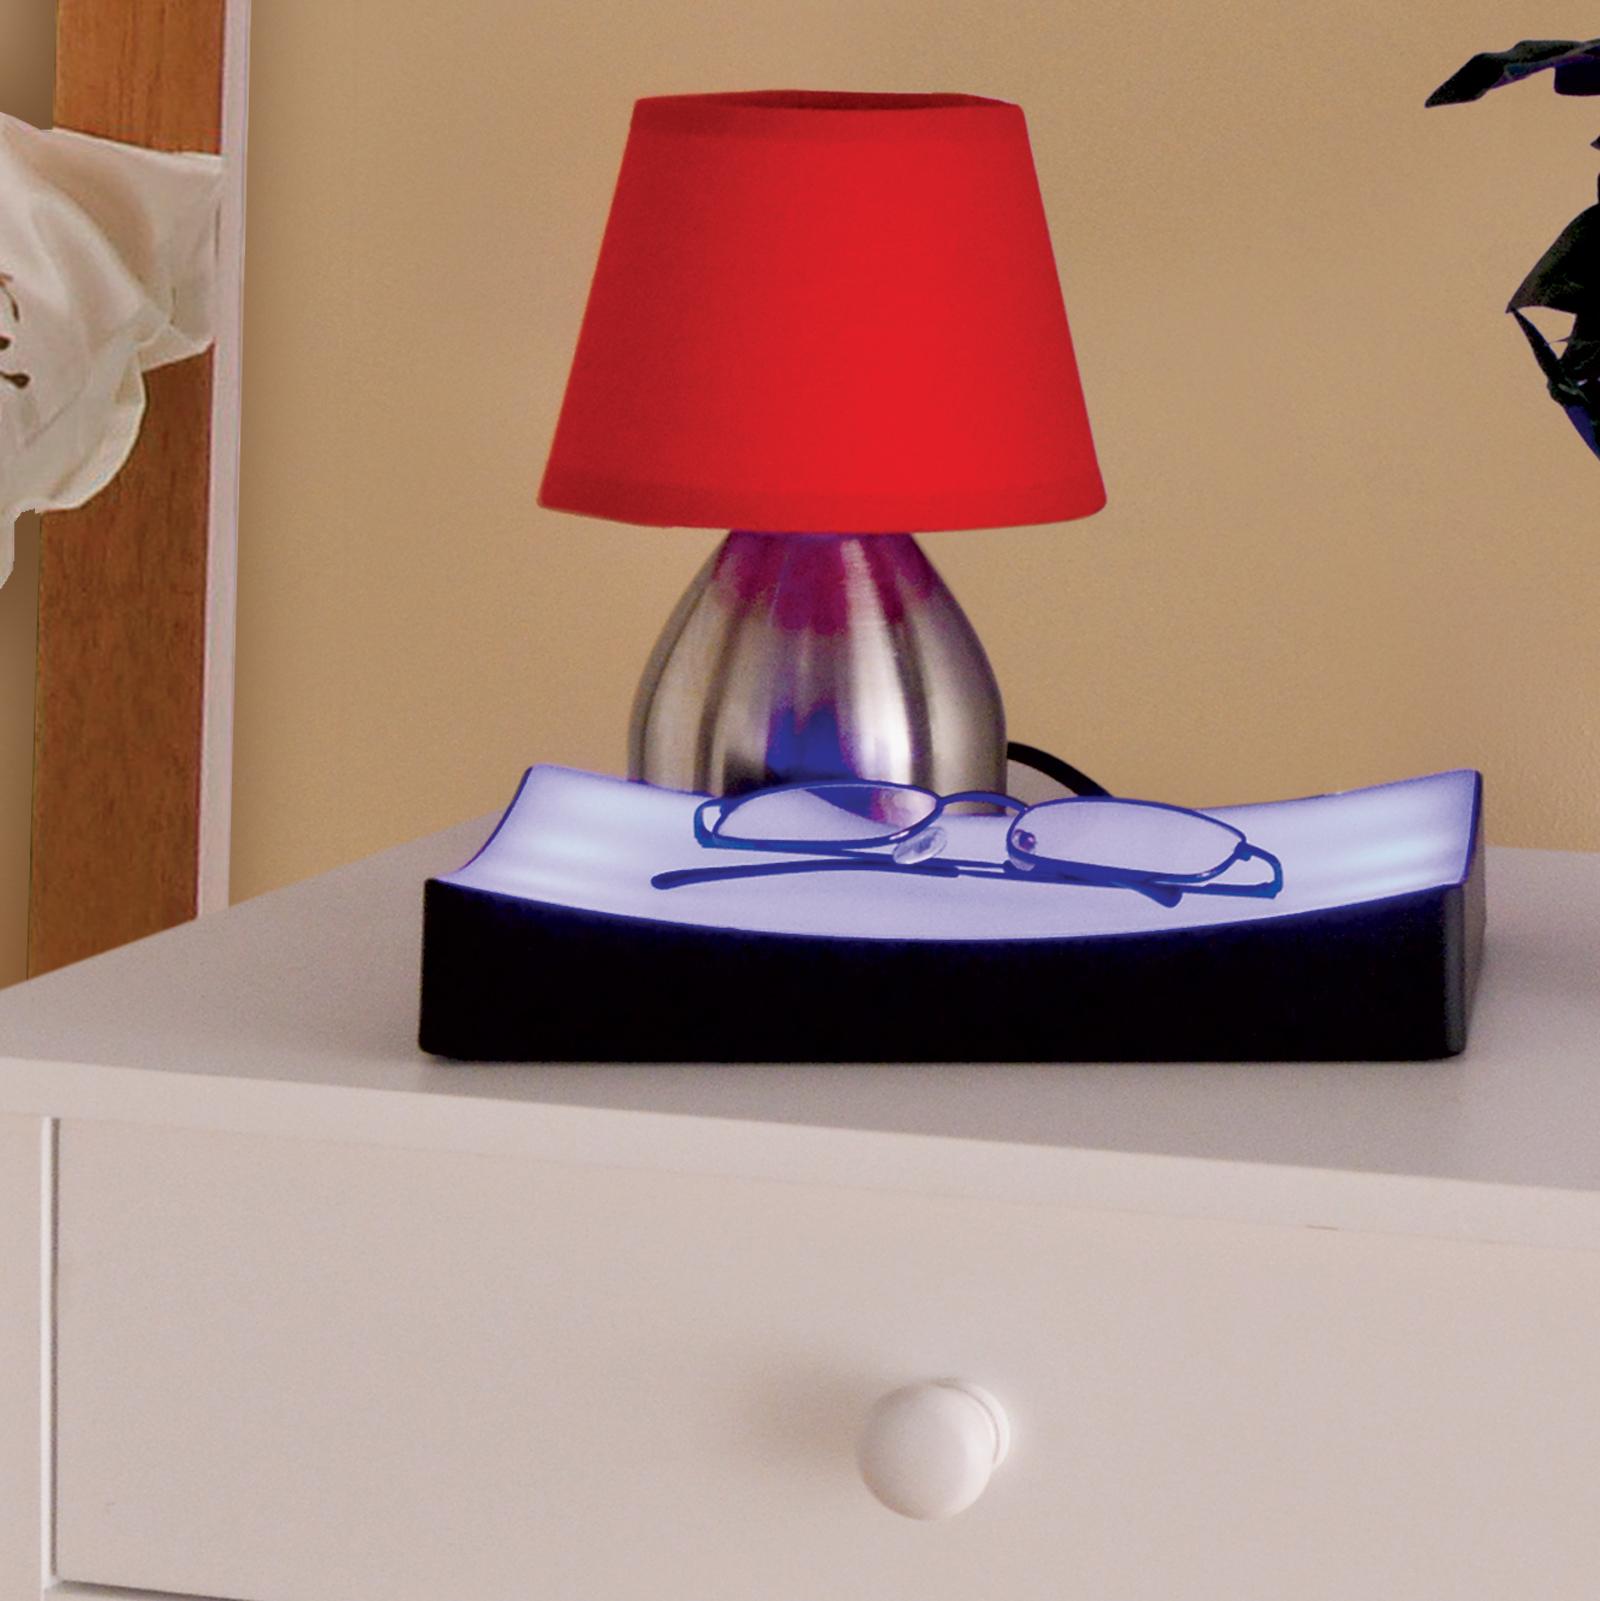 bedside touch lamp tray bedroom lights dimmer blue table blue night light ebay. Black Bedroom Furniture Sets. Home Design Ideas